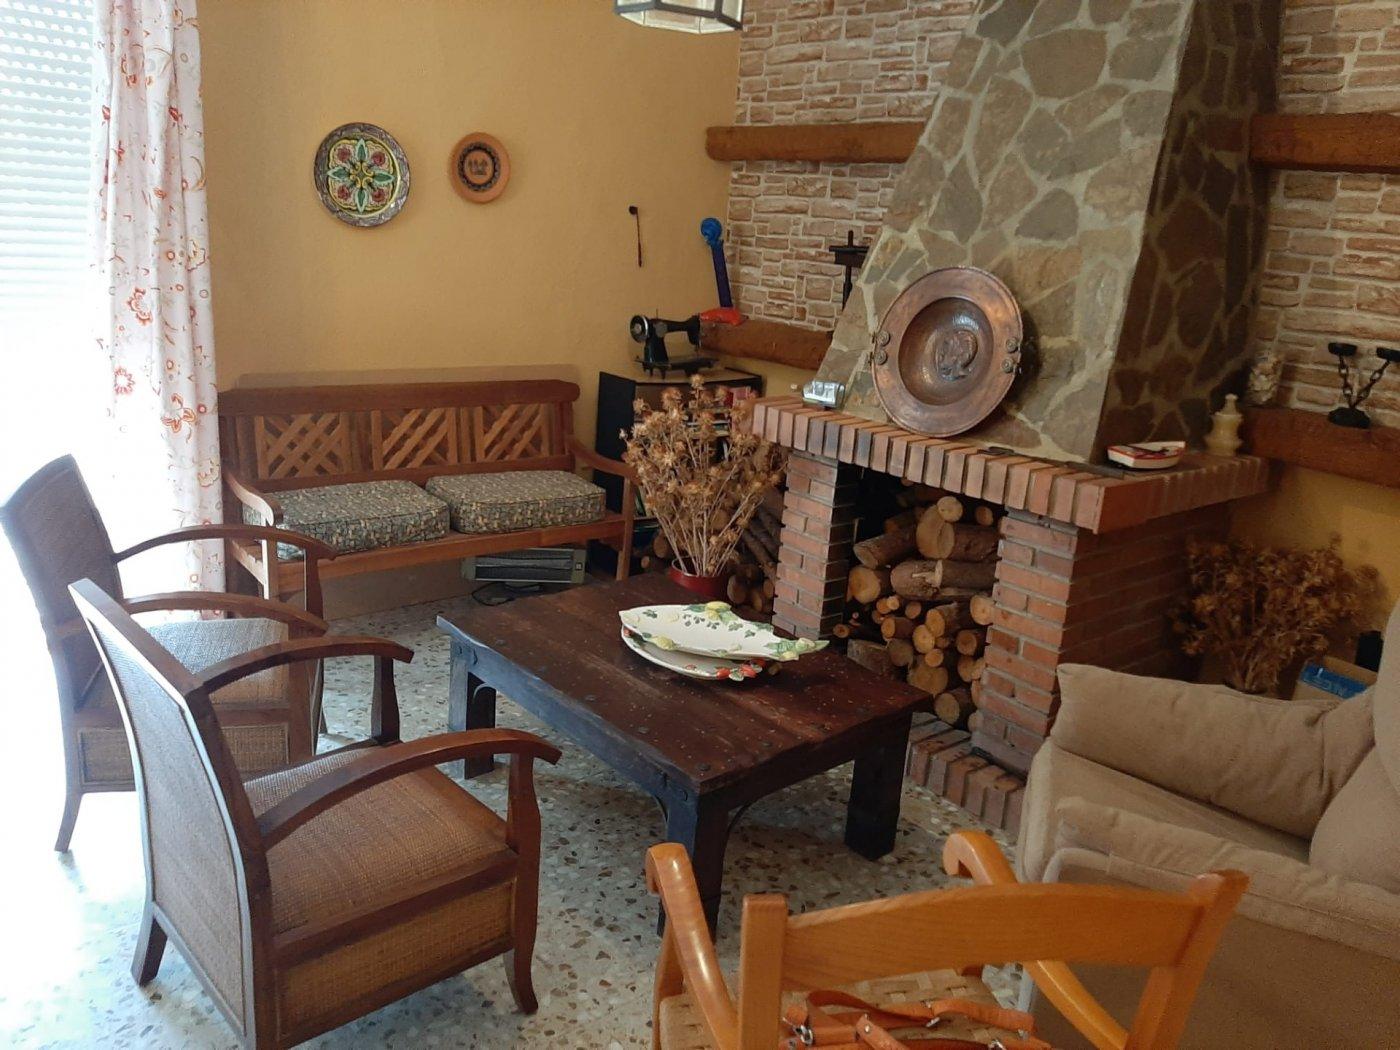 Estupenda casa con piscina propia en zona de assuan- las jaras-cÓrdoba. - imagenInmueble10